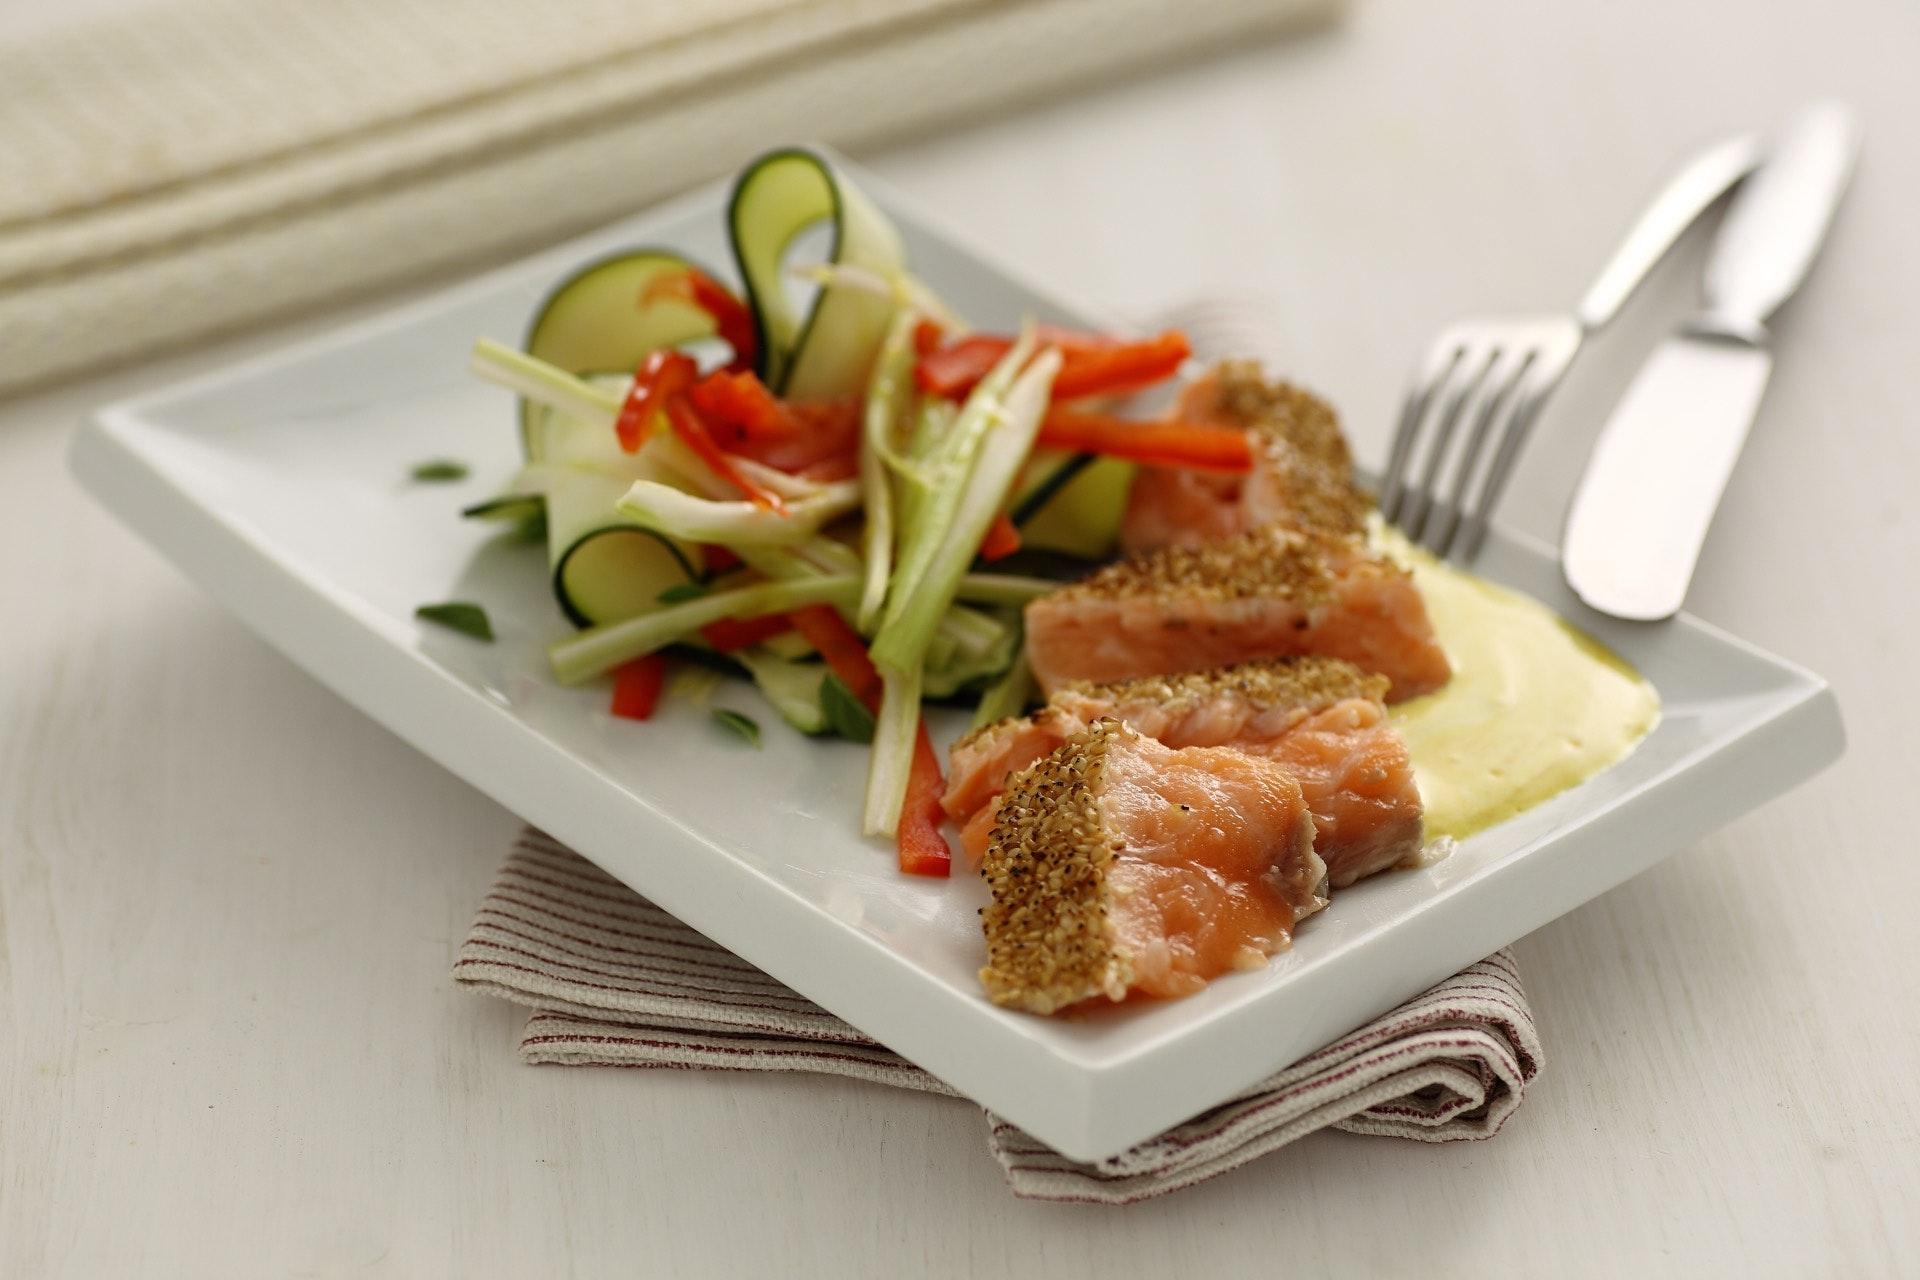 Salmone in crosta di sesamo - Parmalat